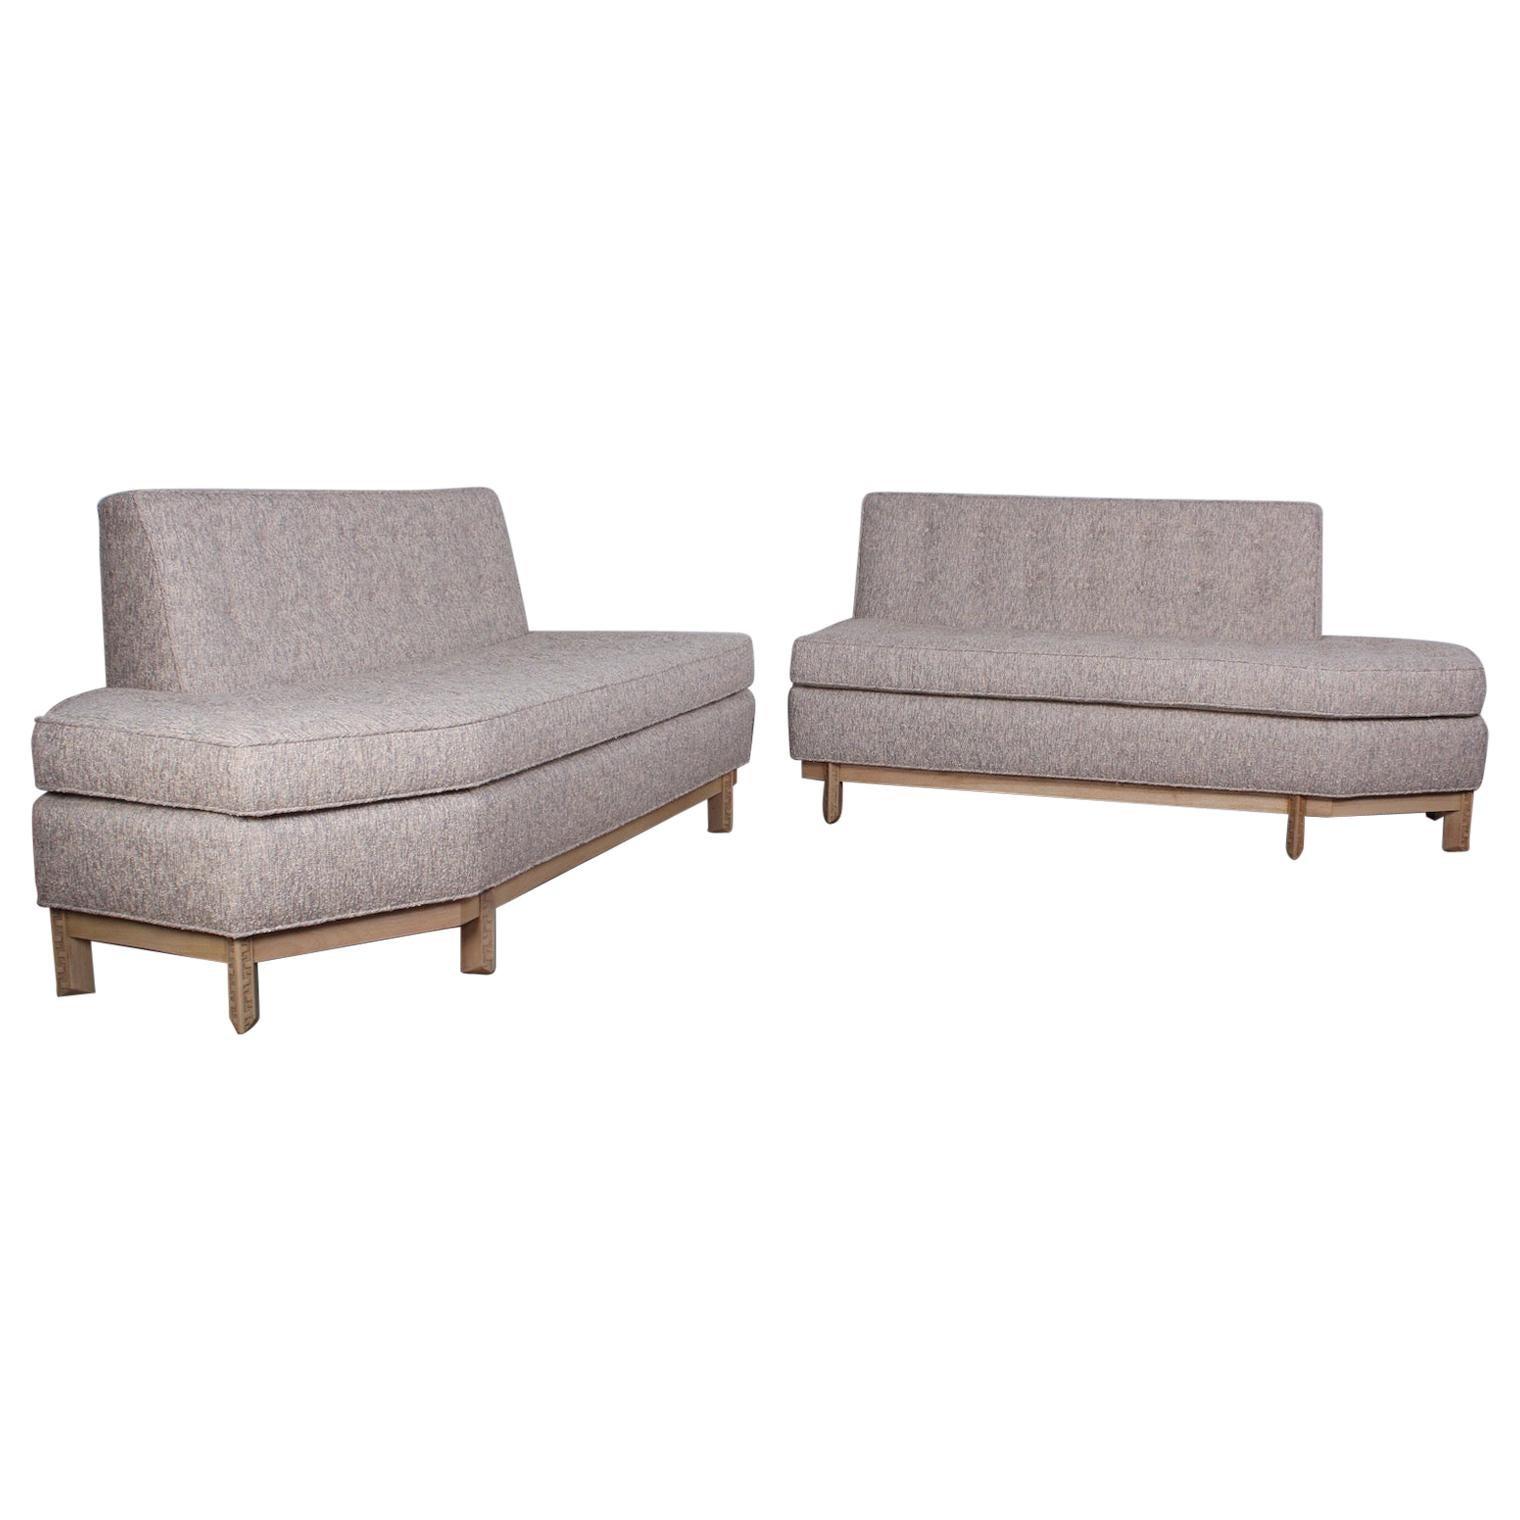 Frank Lloyd Wright Sofa for Henredon